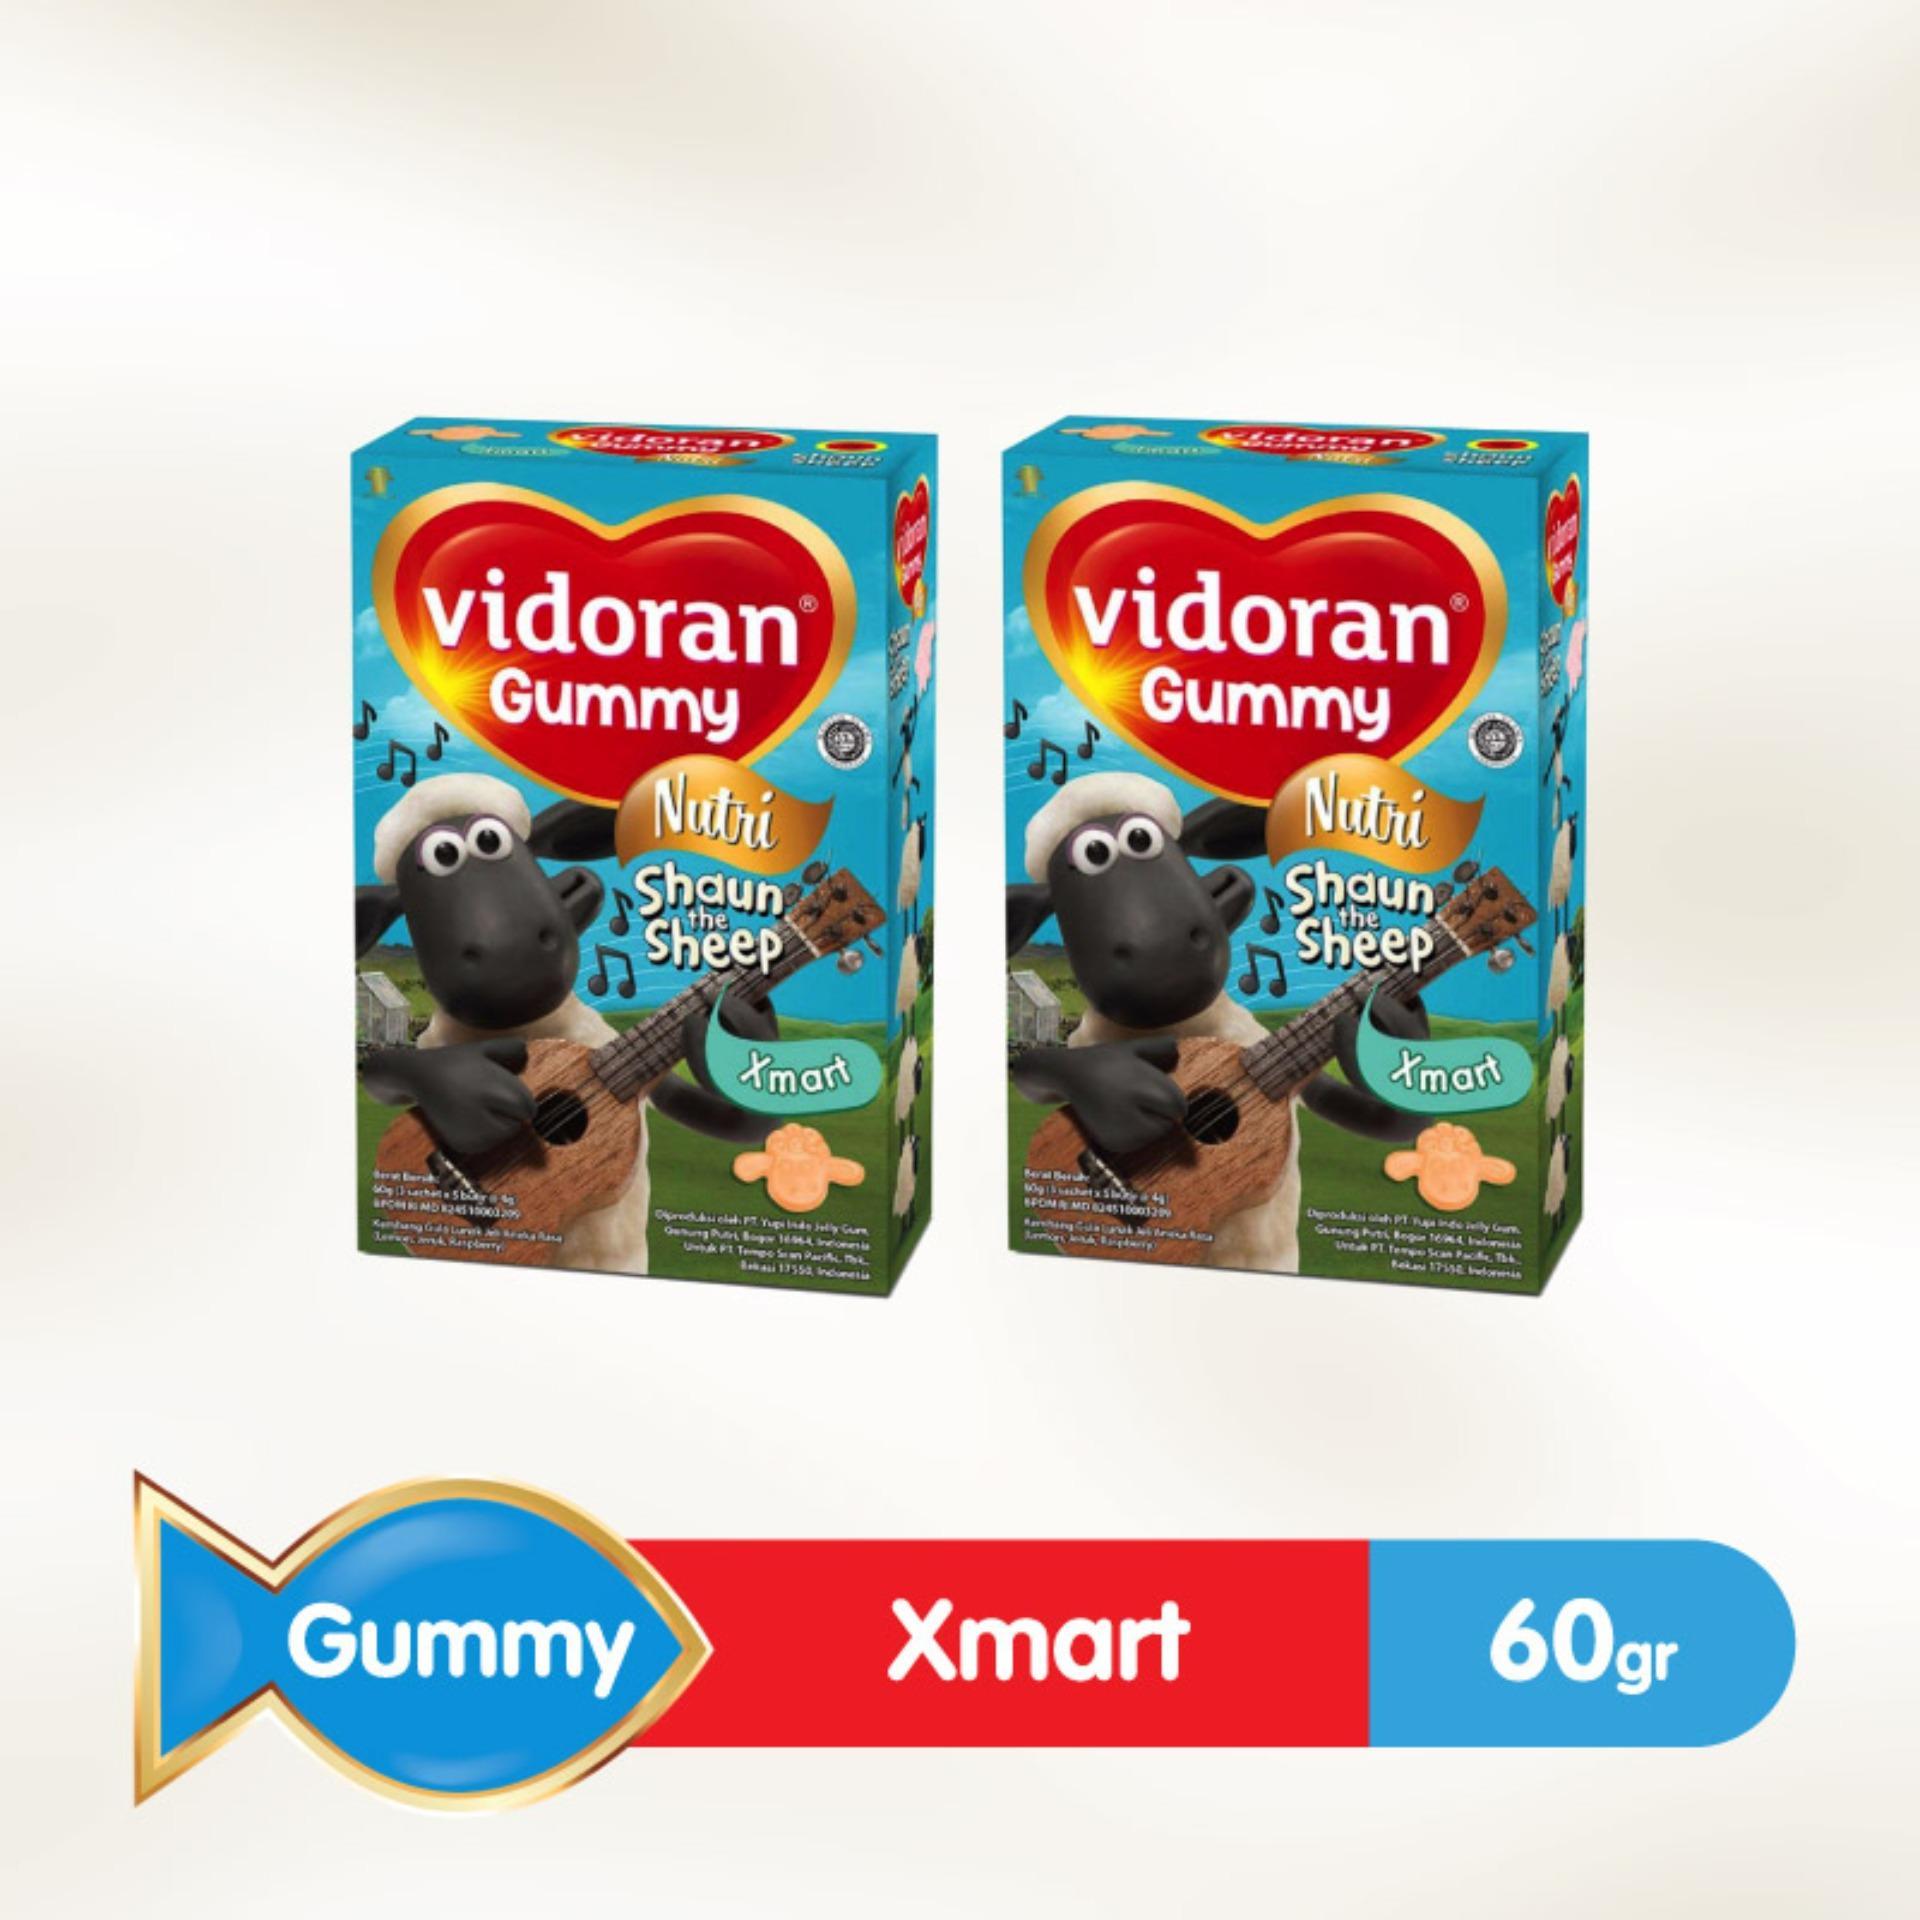 Buy Sell Cheapest Mstore 60g 2 Best Quality Product Deals Wrp Low Fat Milk Chocolate Vanilla 2pcsx60g Vidoran Gummy Xmart Nutri 60 G Pcs